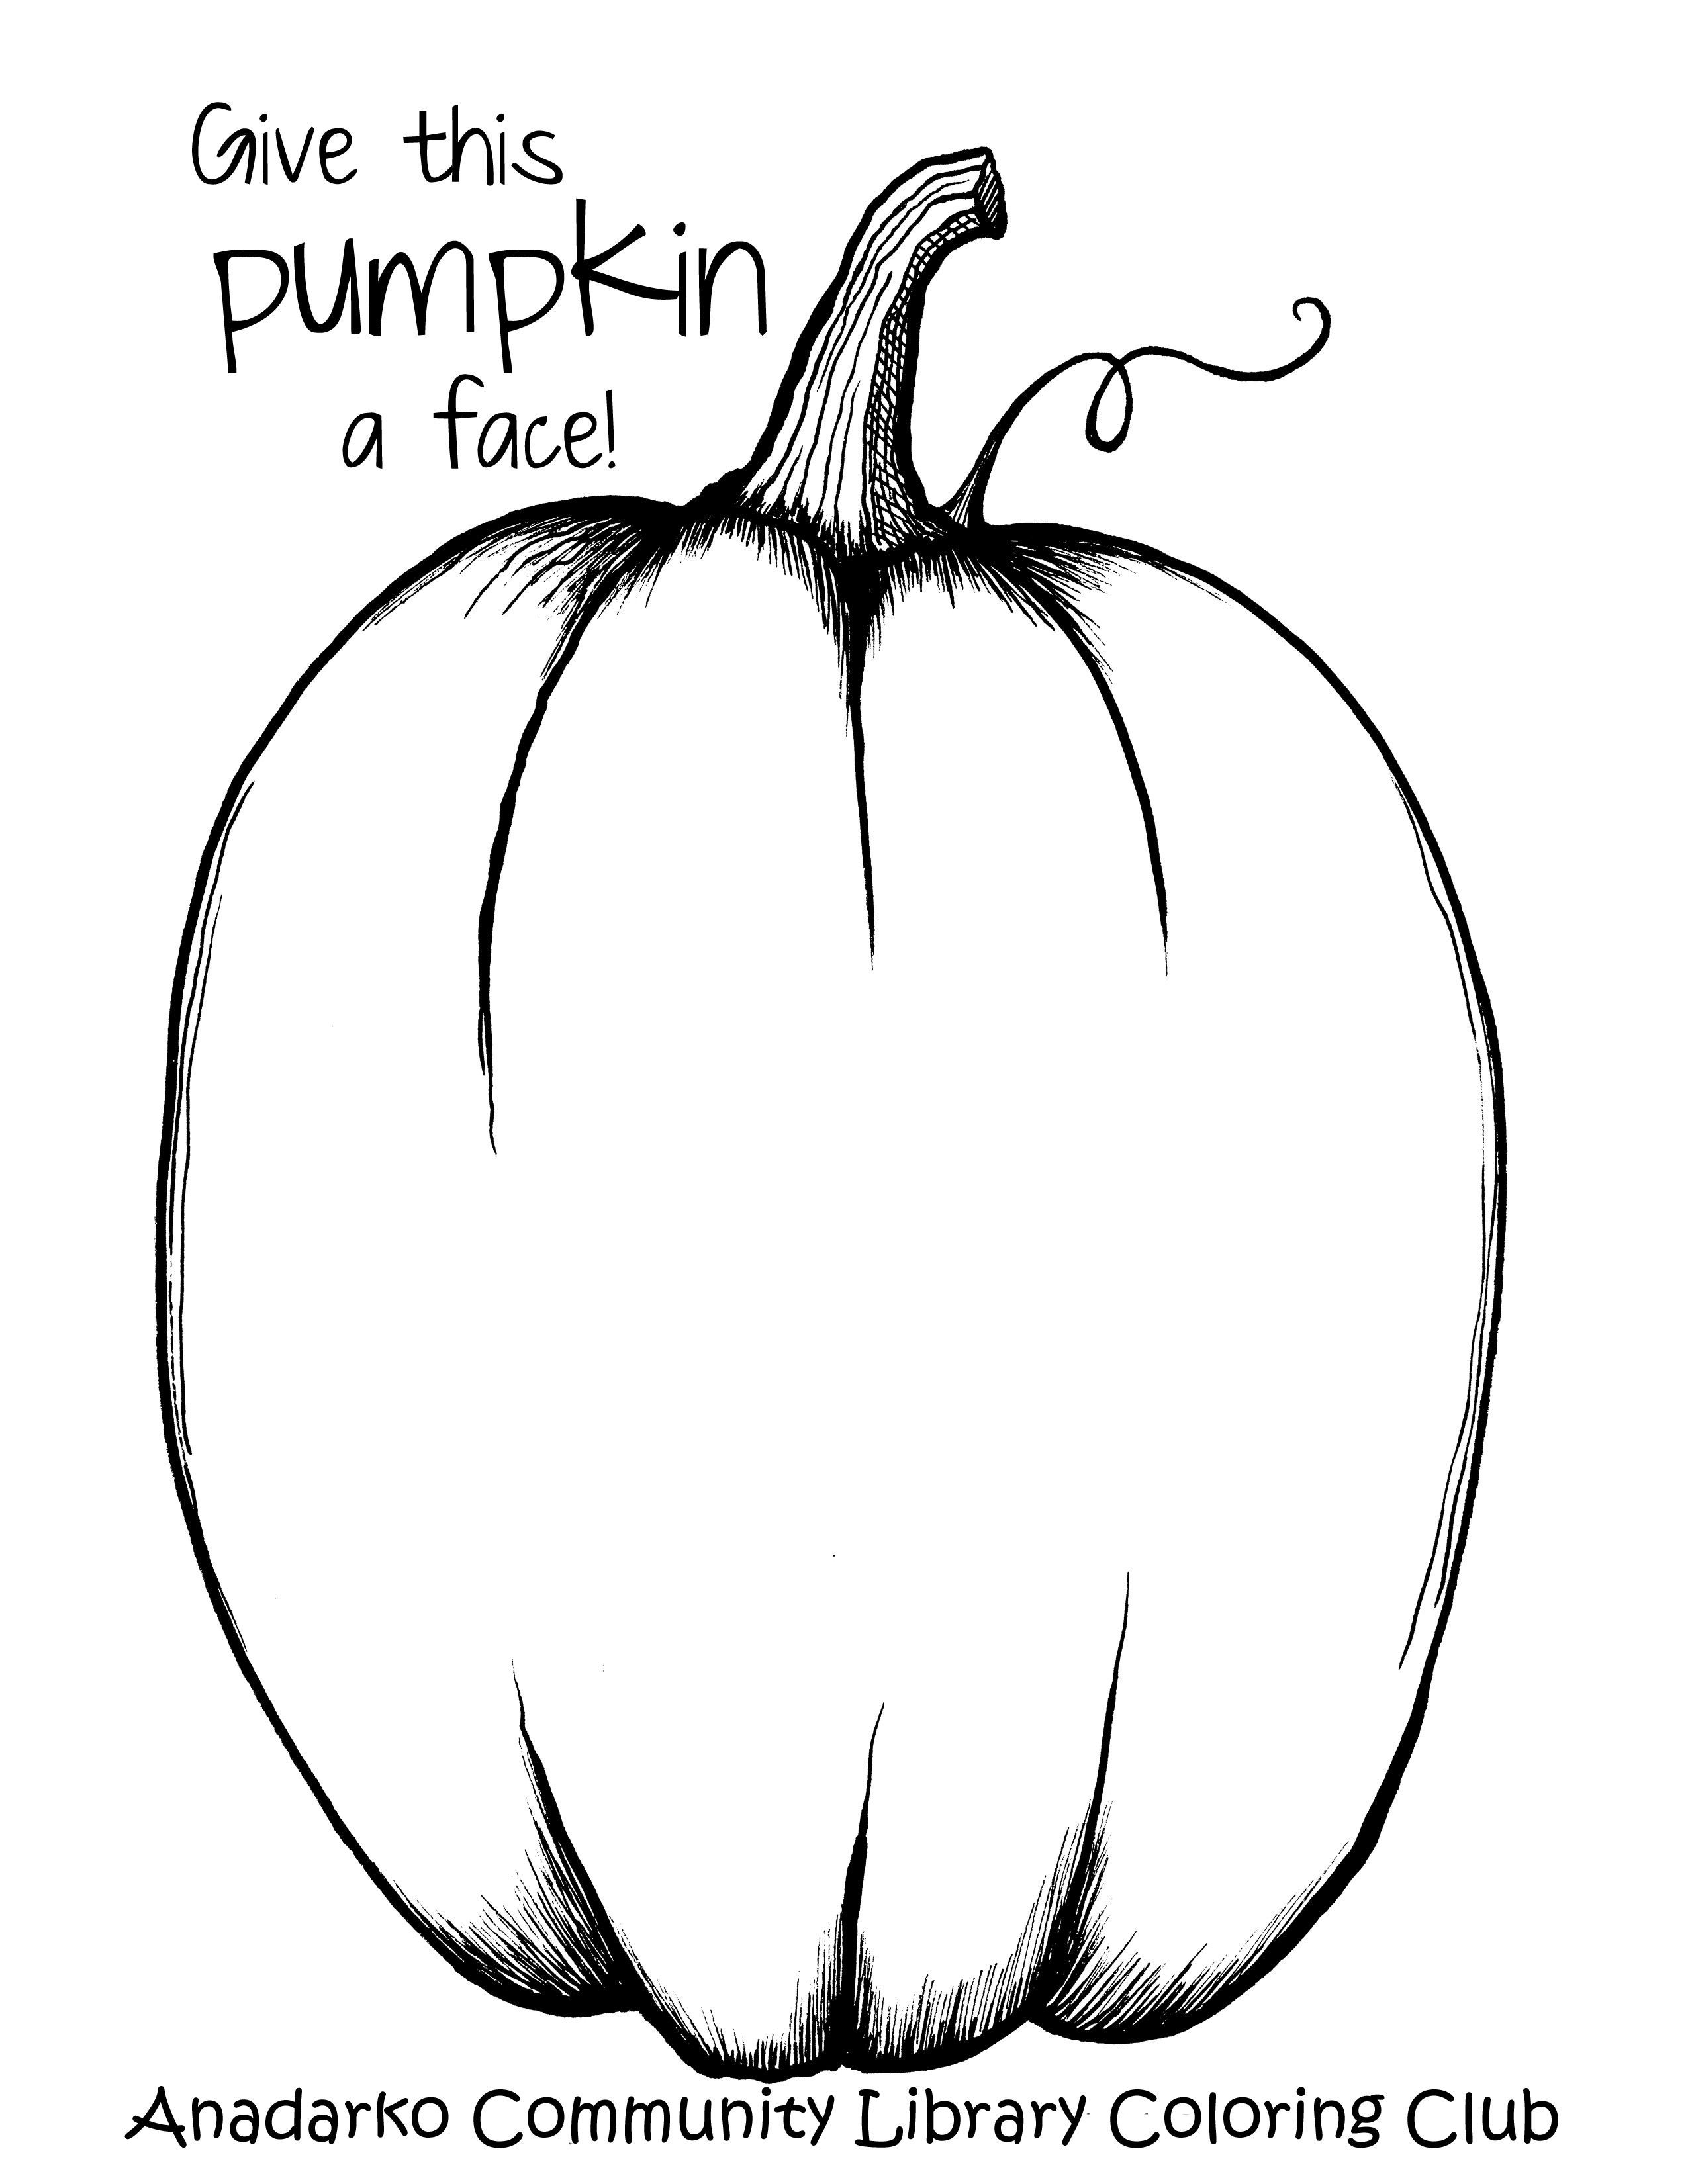 custompumpkinface Pumpkin coloring pages, Halloween